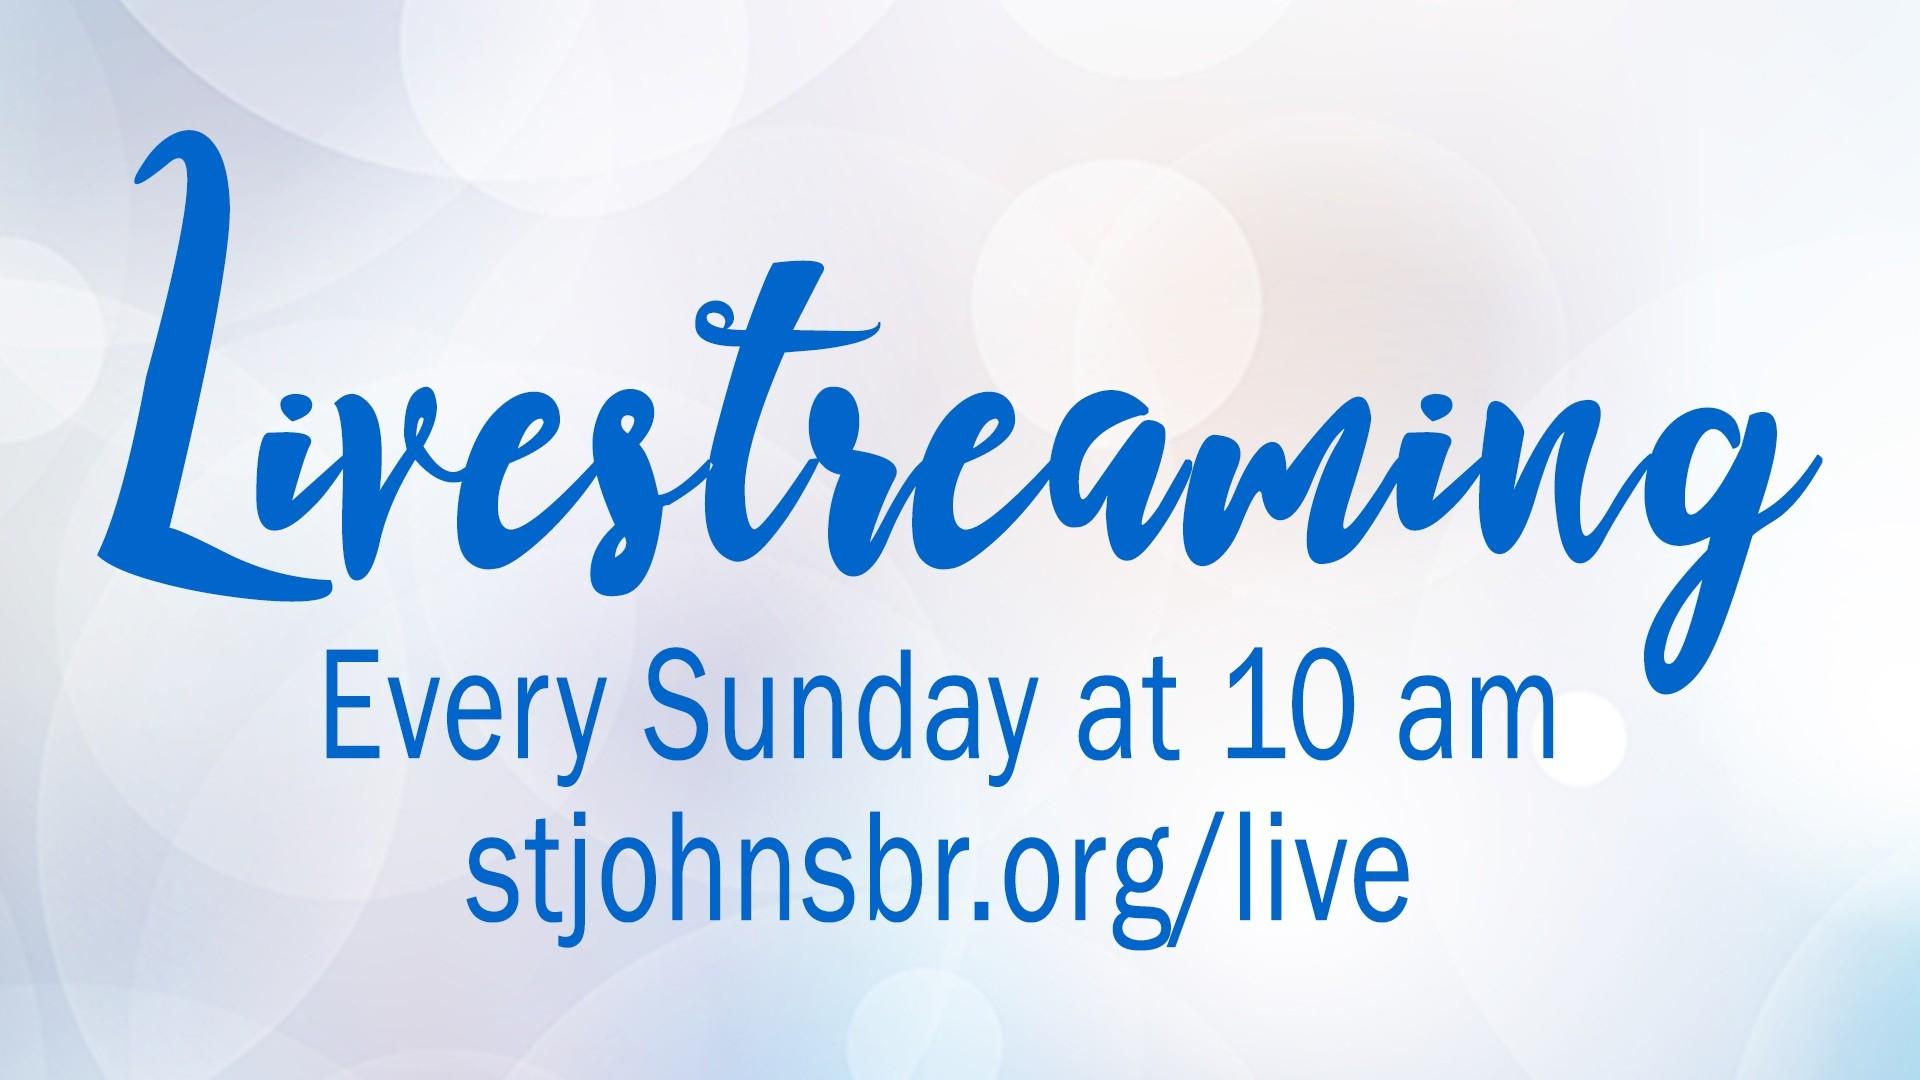 Sunday Worship Livestream – St. John'S Umc  August 2, 2021 Is What Methodist Liturgical Sunday